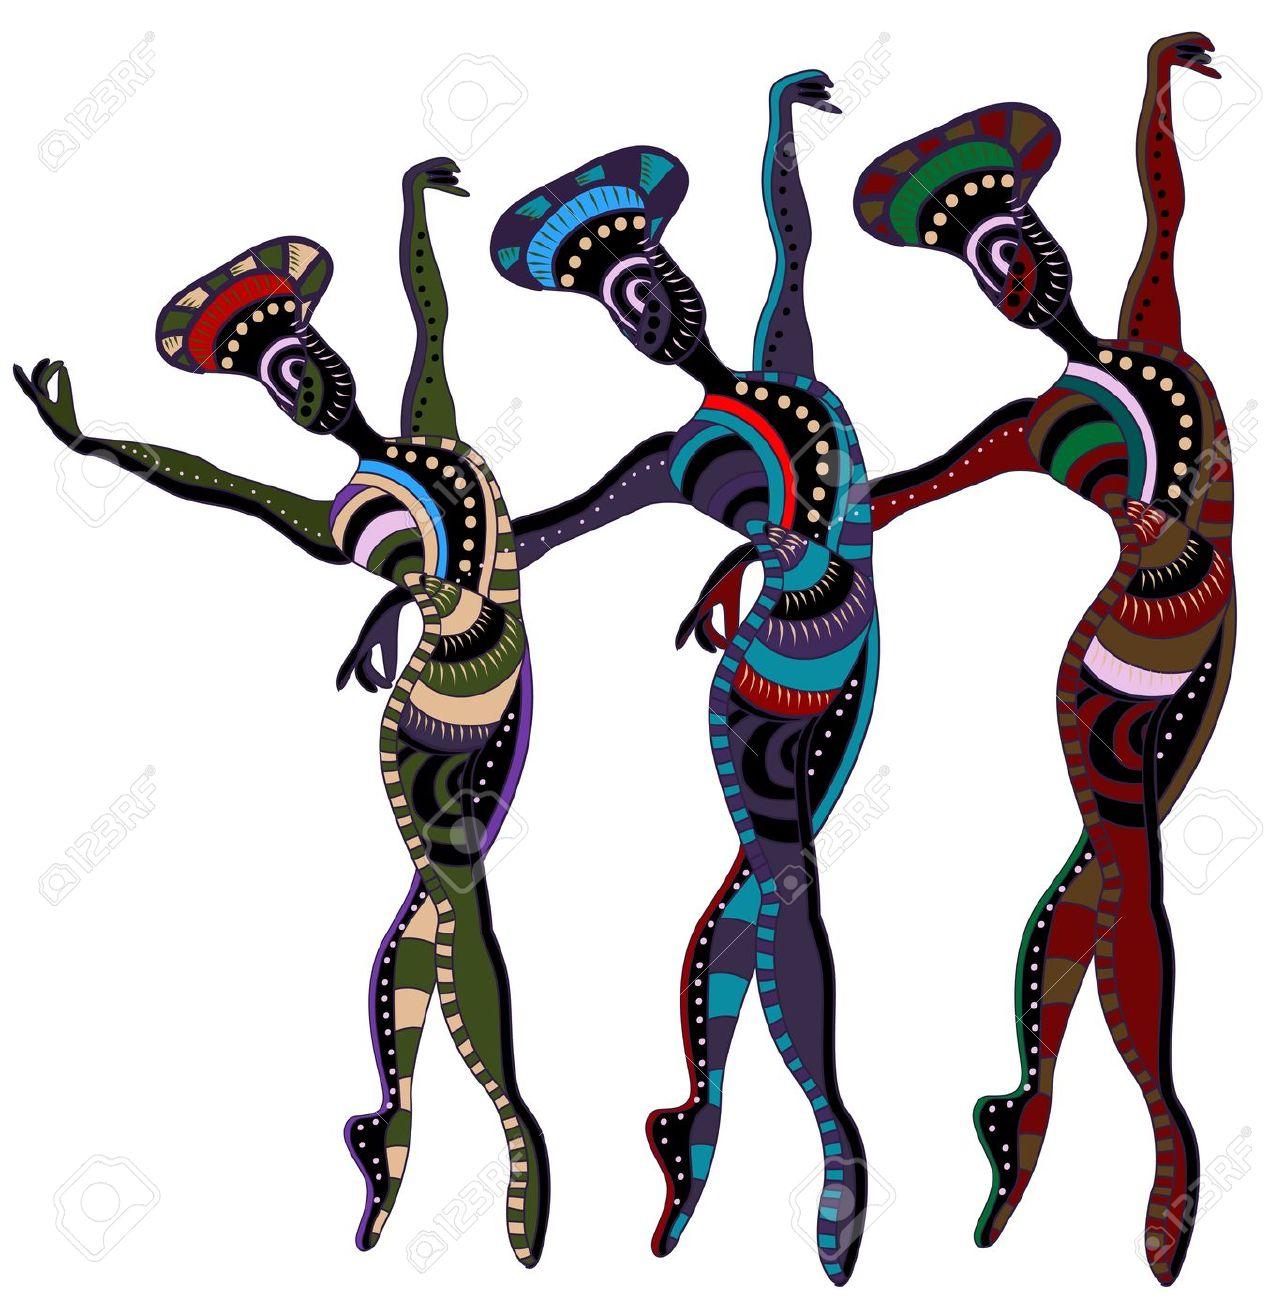 Folk clipart cultural dance Philippines Clipart Folk Collection Dance